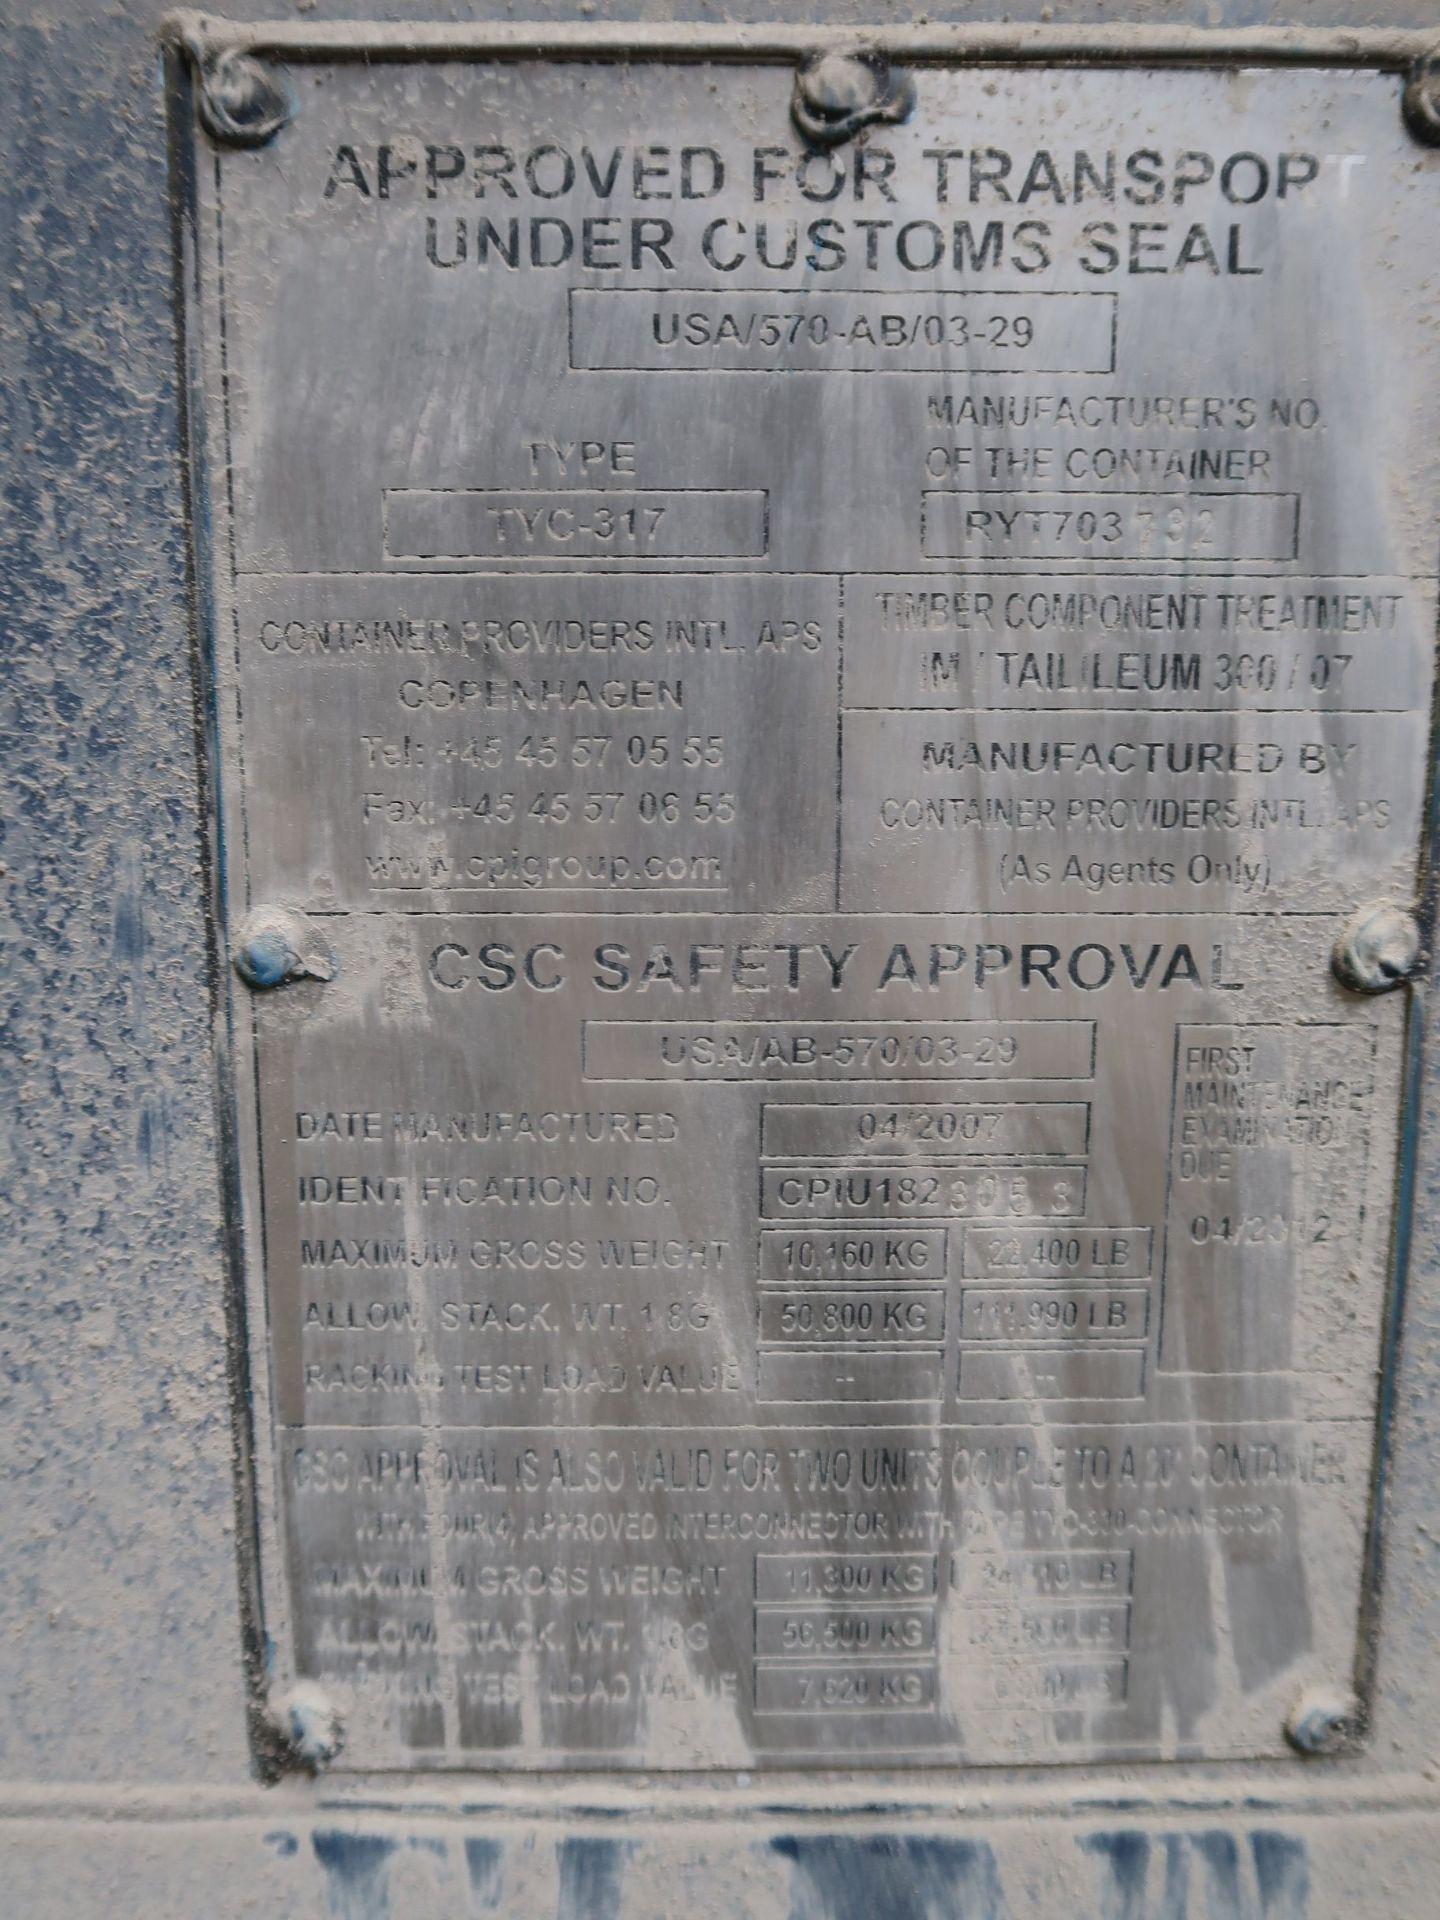 Lot 380 - 8' X 8' CONTAINER PROVIDER INTL CONEX STORAGE CONATINER WITH STANDARD END DOOR, 563 CU. FT.